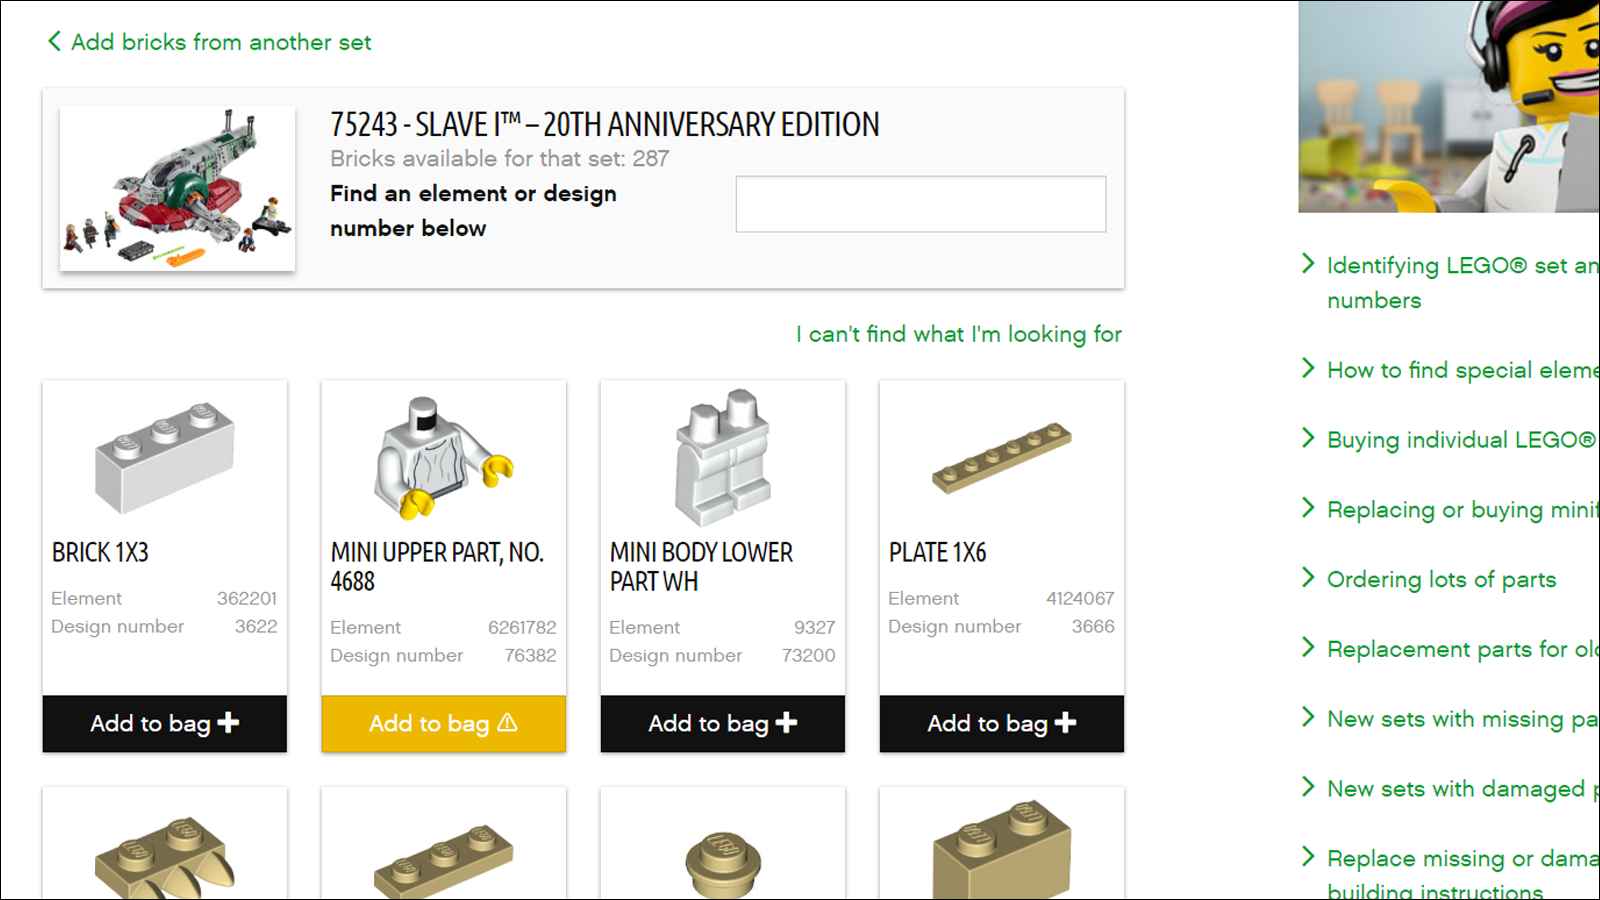 Brick selection menu